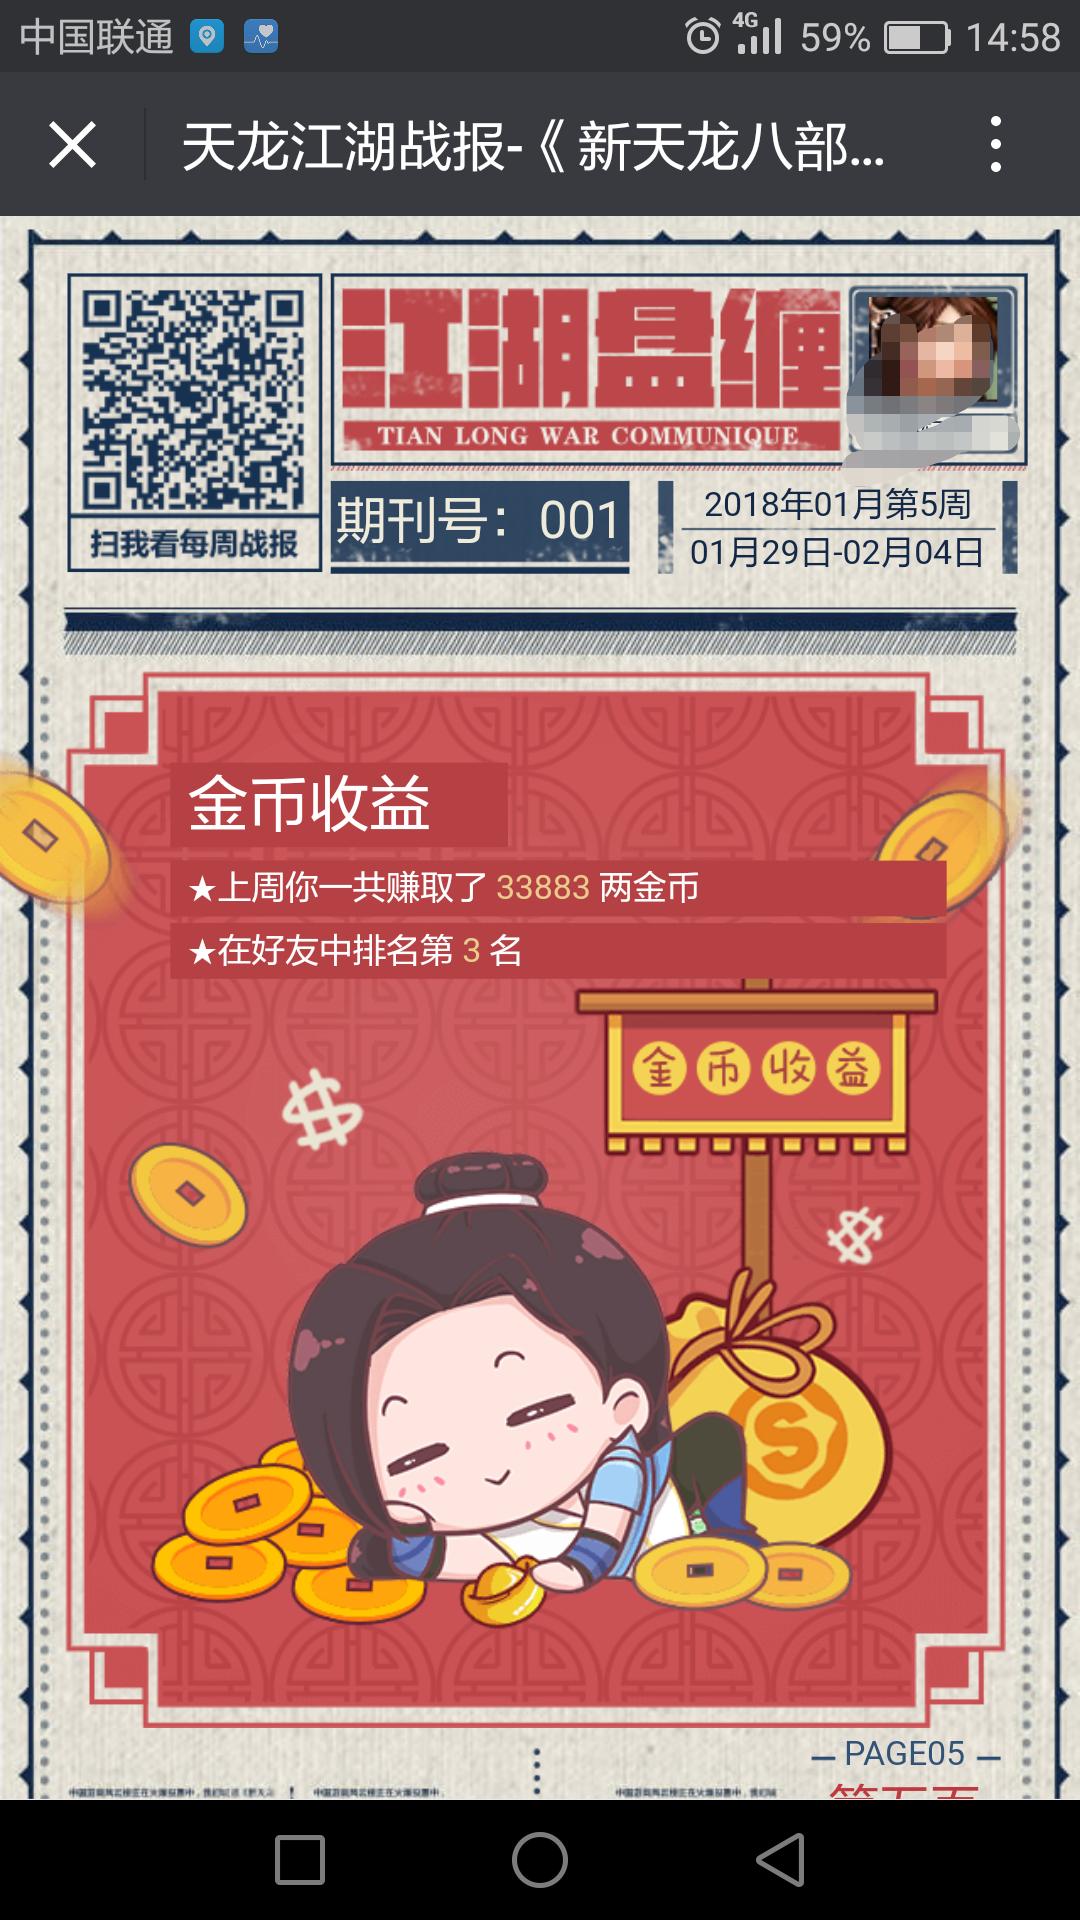 QQ图片20180207150523.png